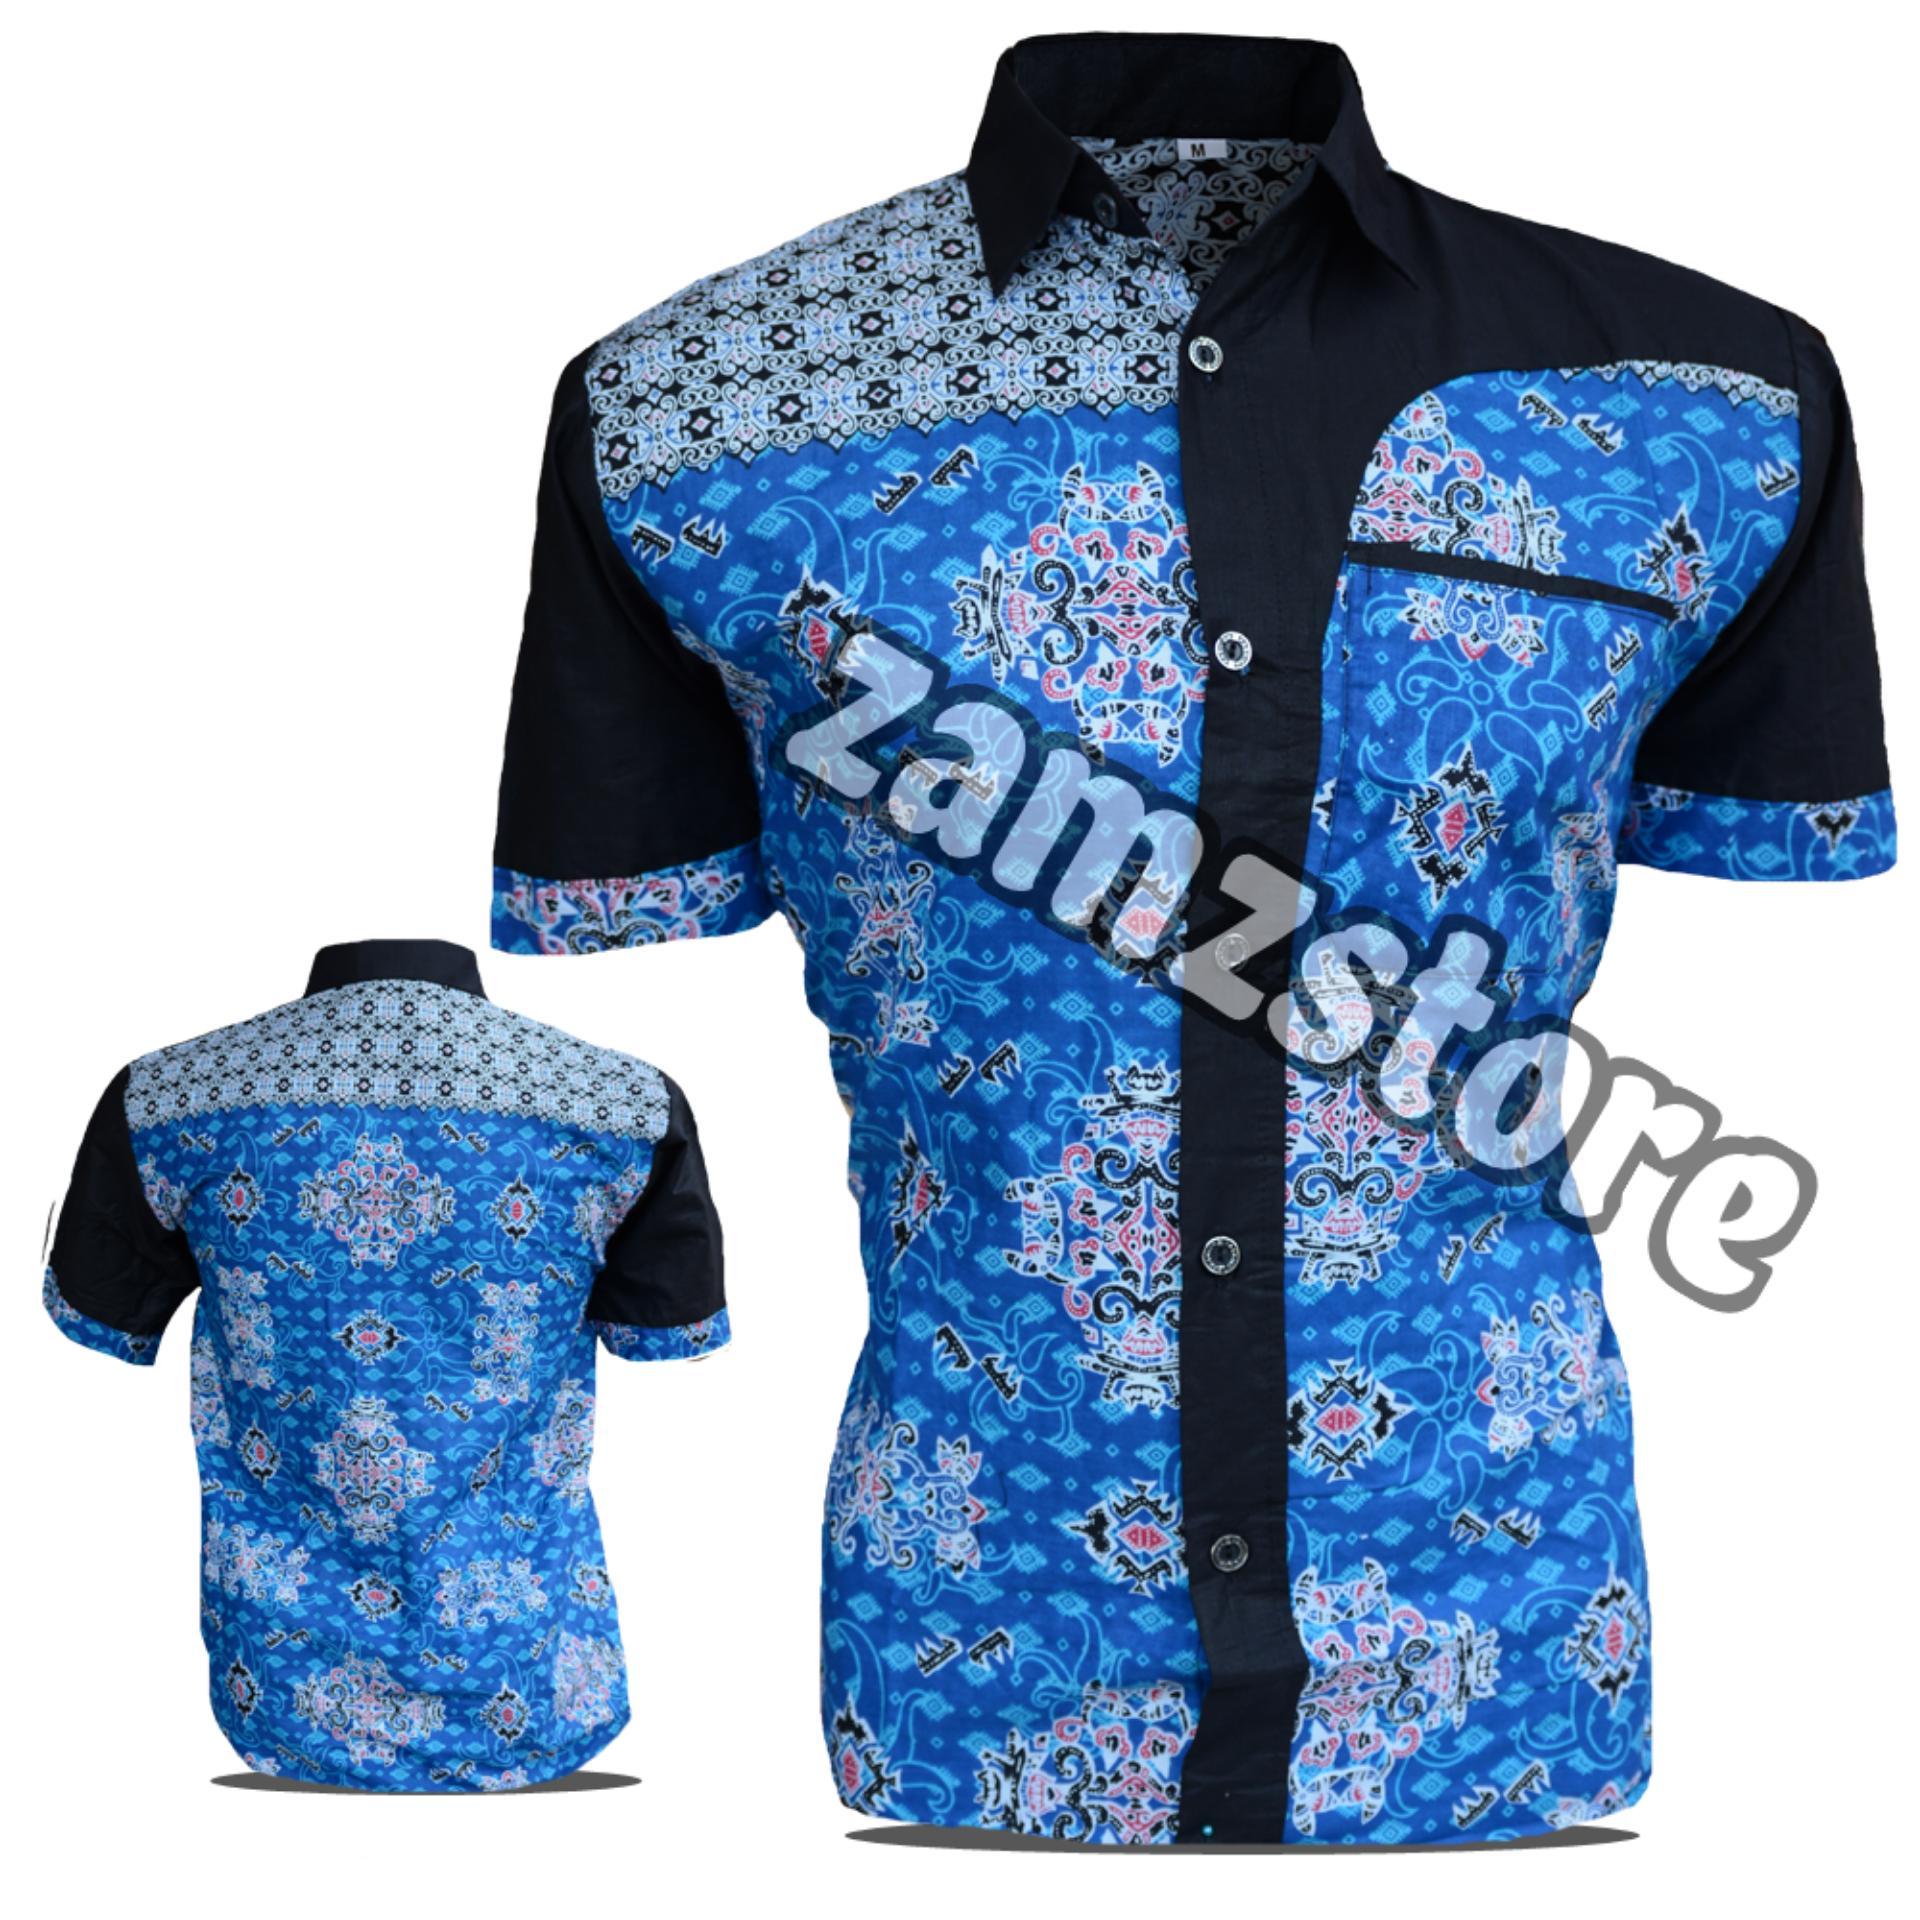 Desain Batik Kombinasi Polos Pria: MURAH SriKaWati Fashion Baju Kemeja Hem Atasan Katun Batik